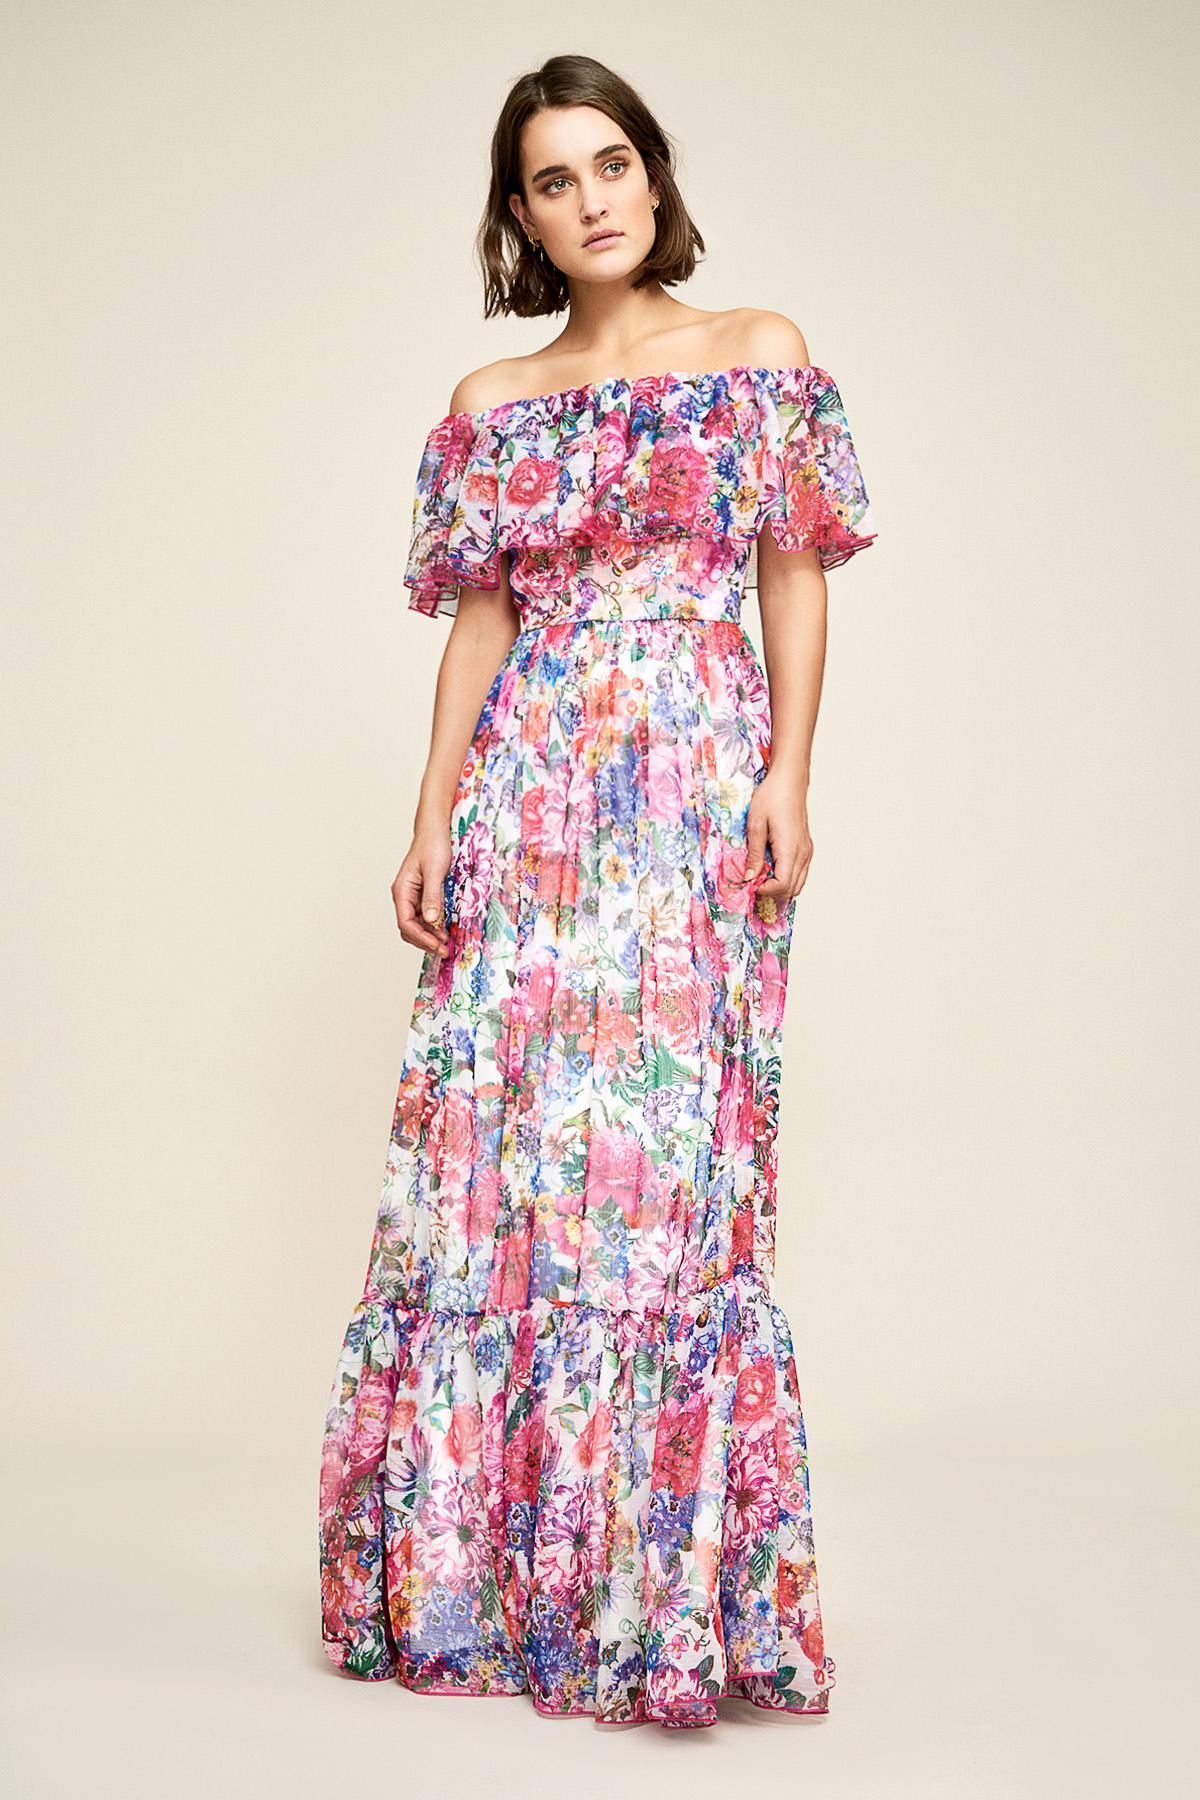 99315391f681 Tadashi Shoji. Women s Paola Floral Print Maxi Dress